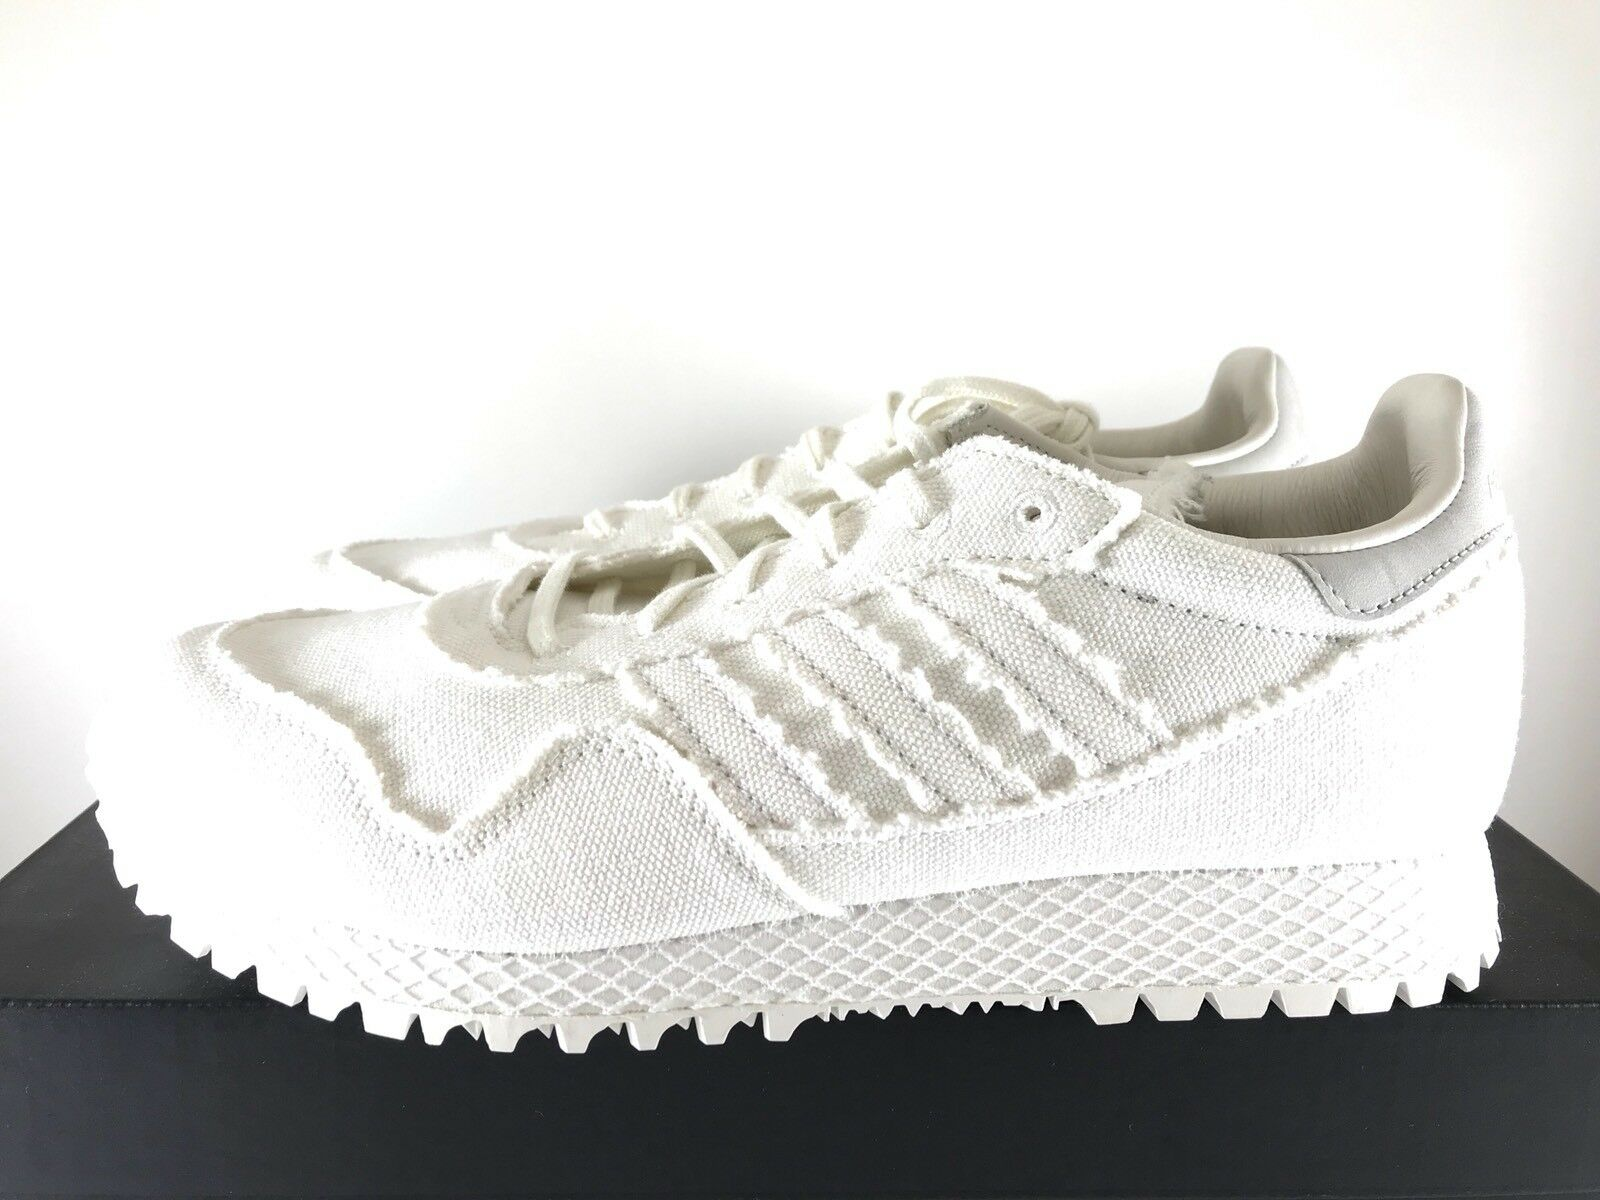 Adidas consorzio new passato york daniel arsham cm7193 passato new 1 impulso 3 uomini 8 1916a7